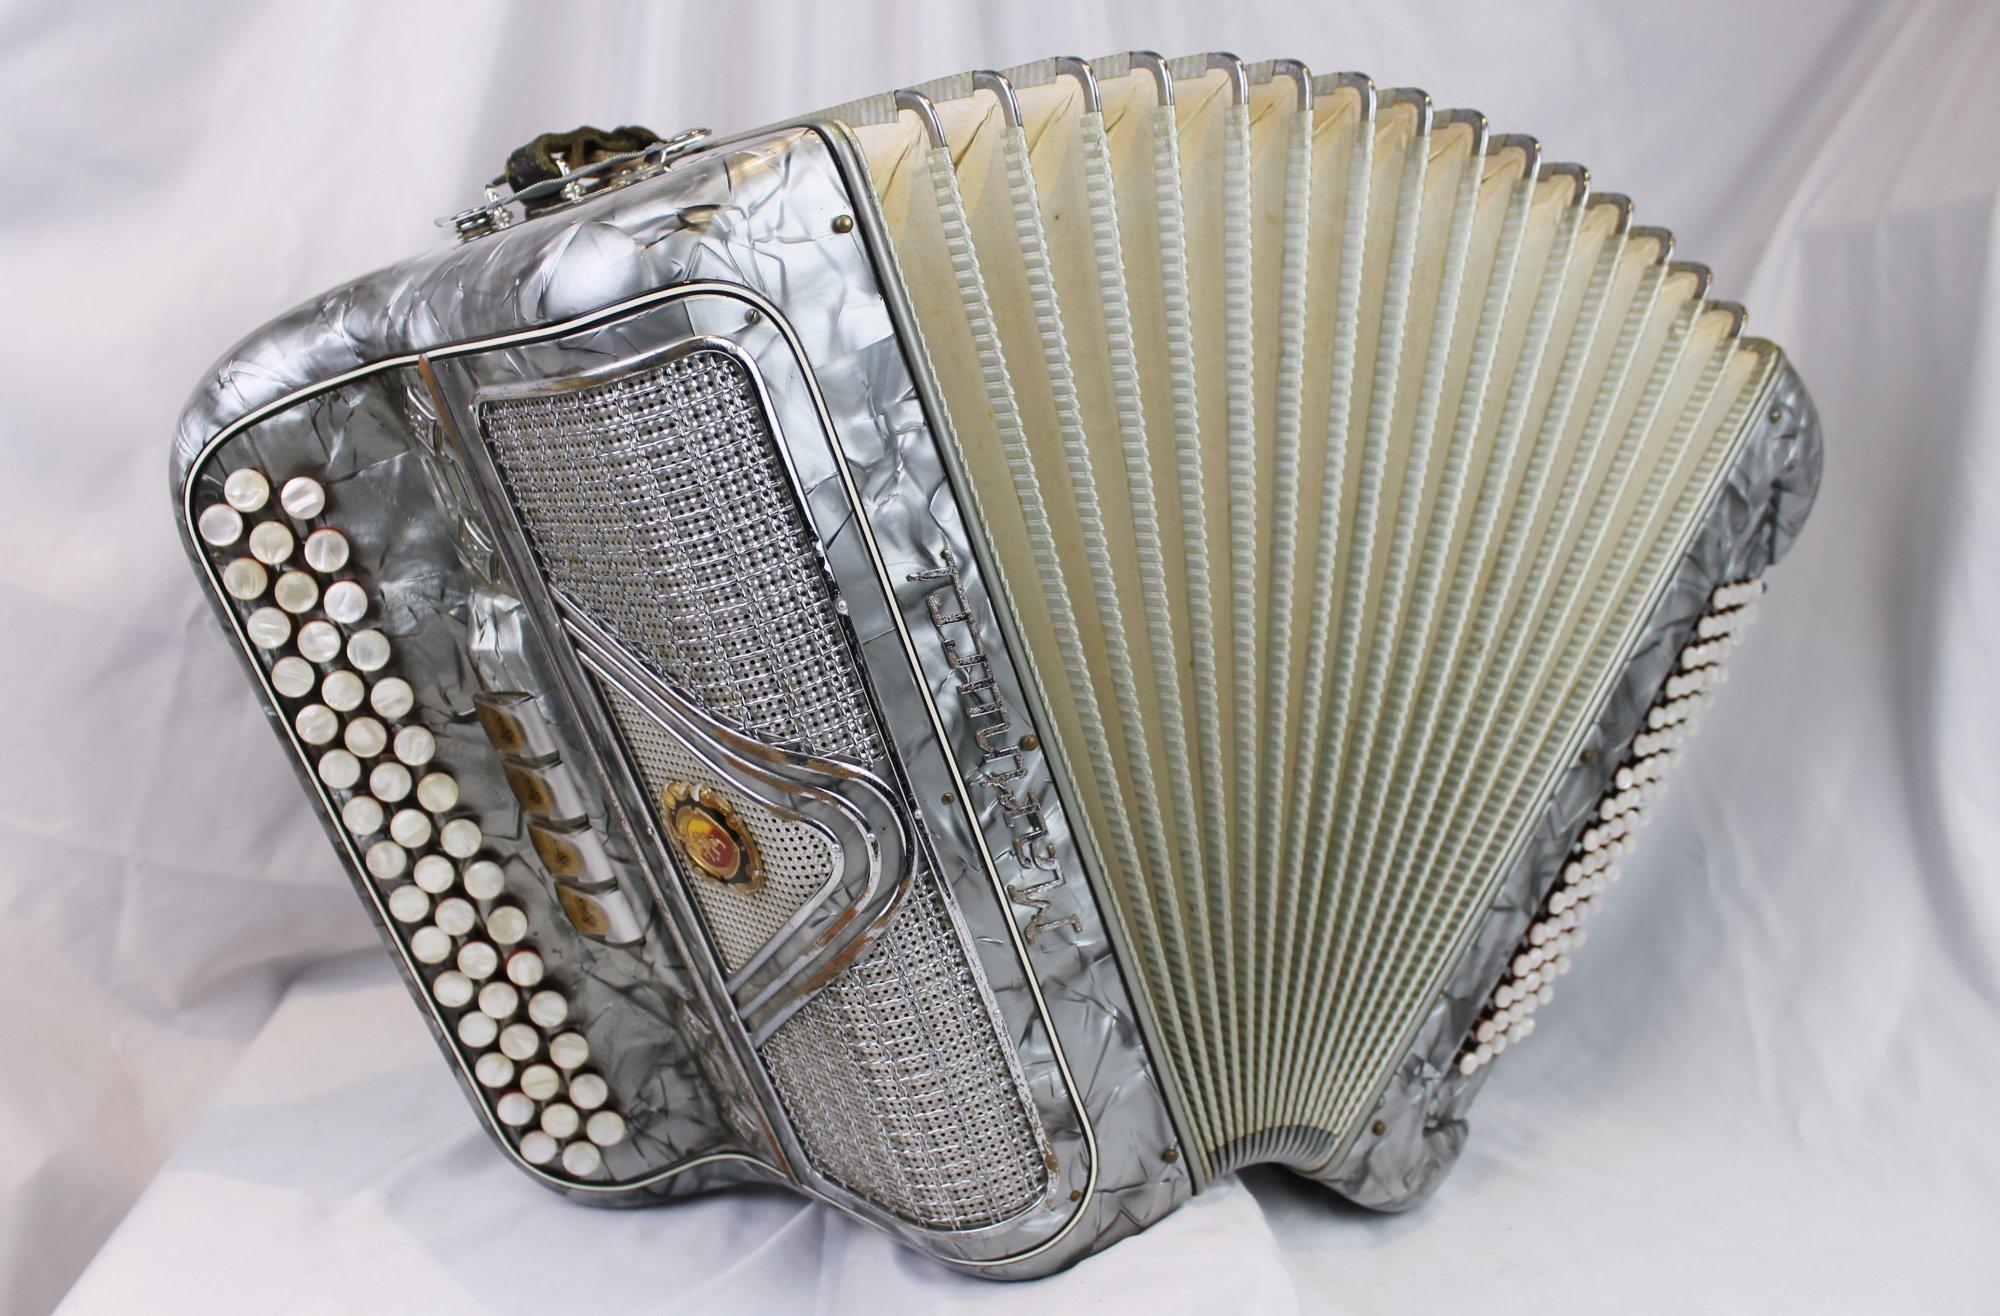 4552 - Silver Marinucci Chromatic Button Accordion C System LMM 46 80